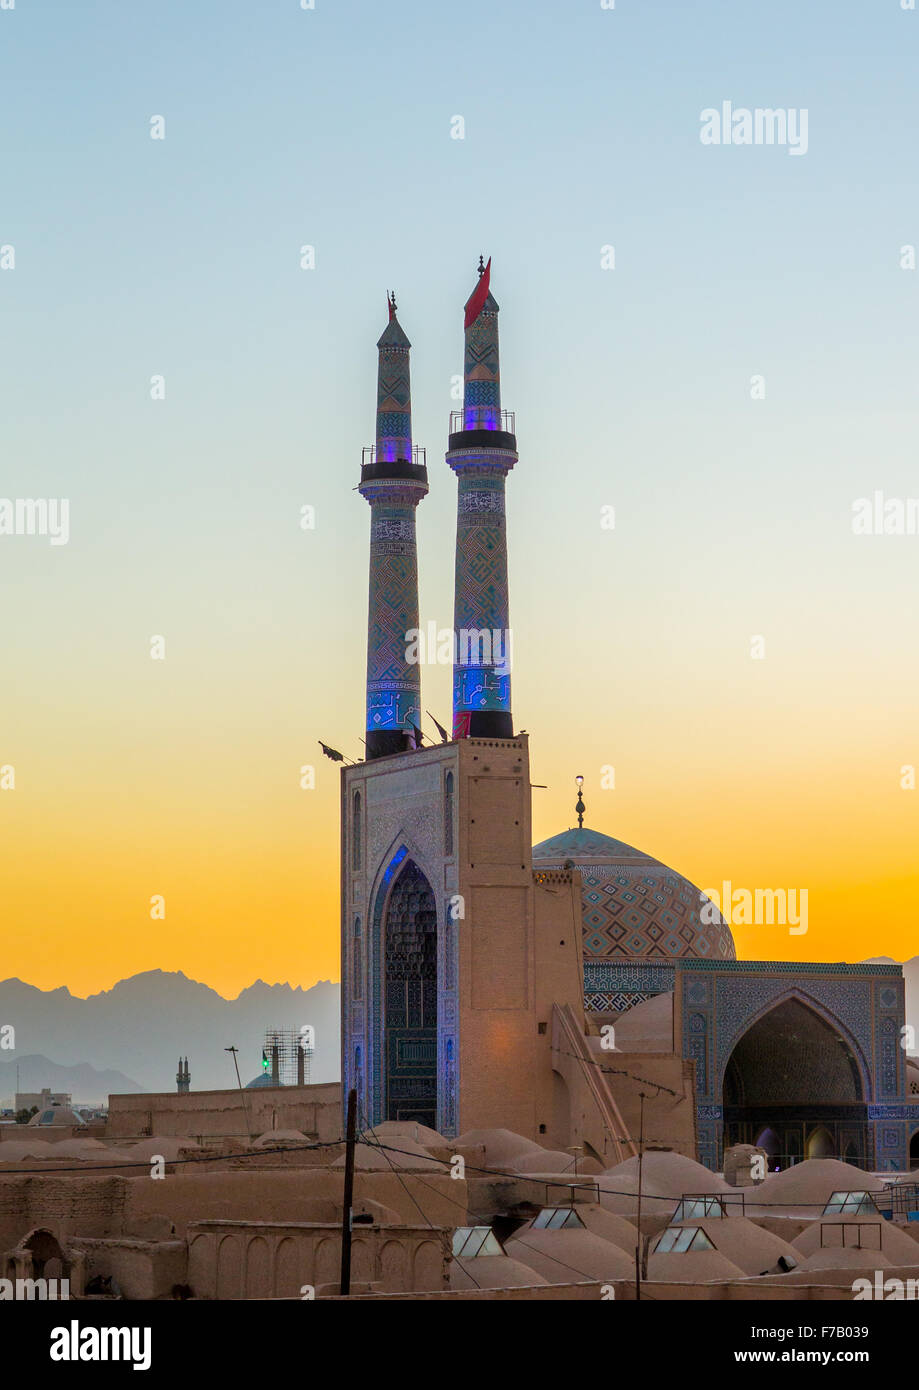 Mosquée Jameh ou Mosquée du Vendredi, la province de Yazd Yazd, Iran, Photo Stock